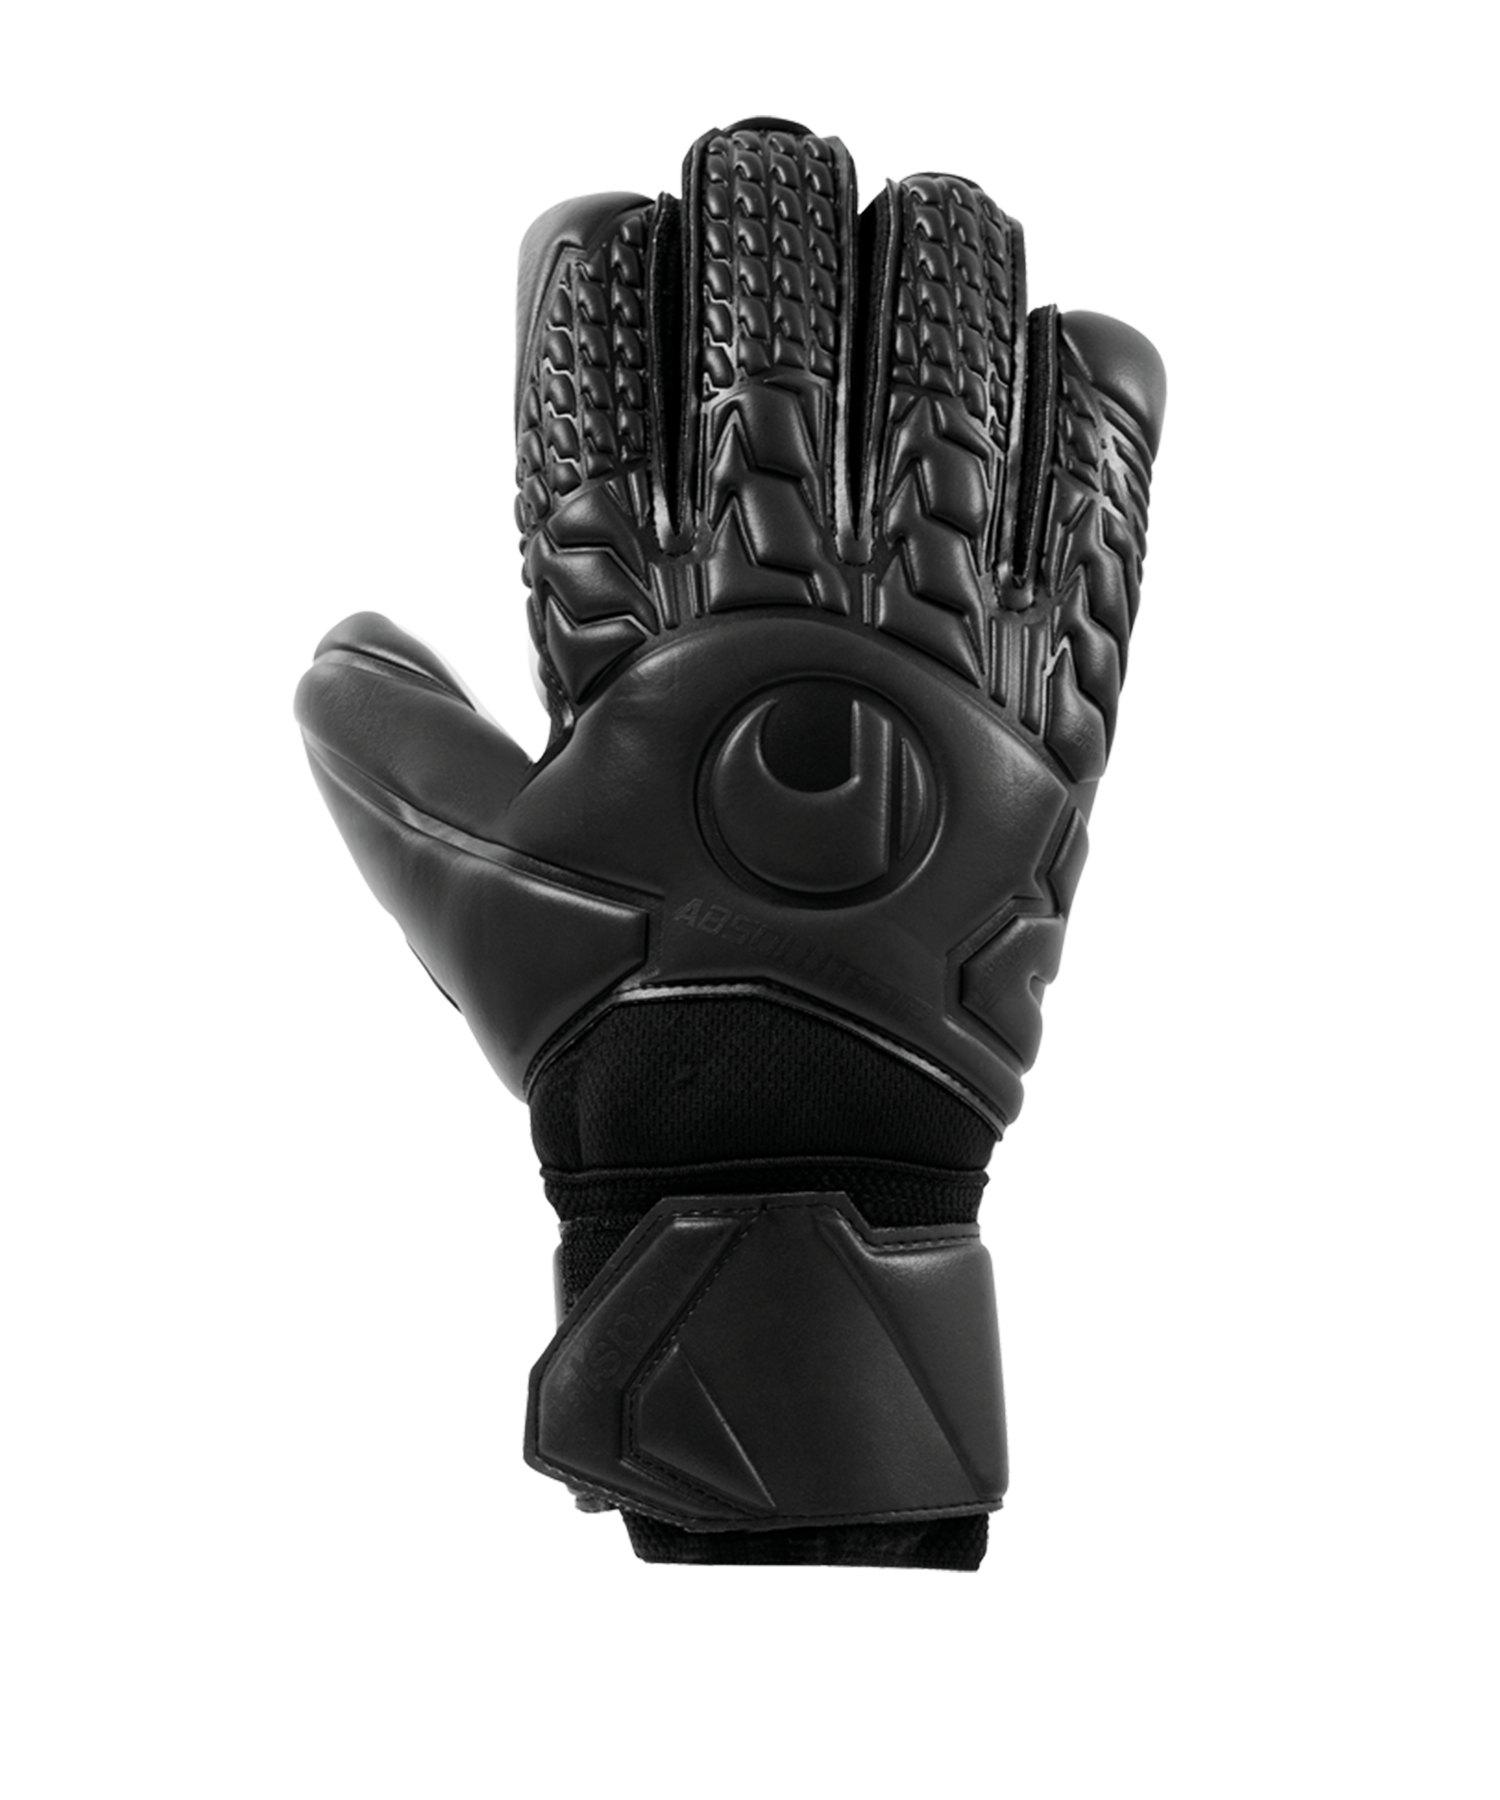 Uhlsport Comfort AG TW-Handschuh Schwarz F01 - schwarz